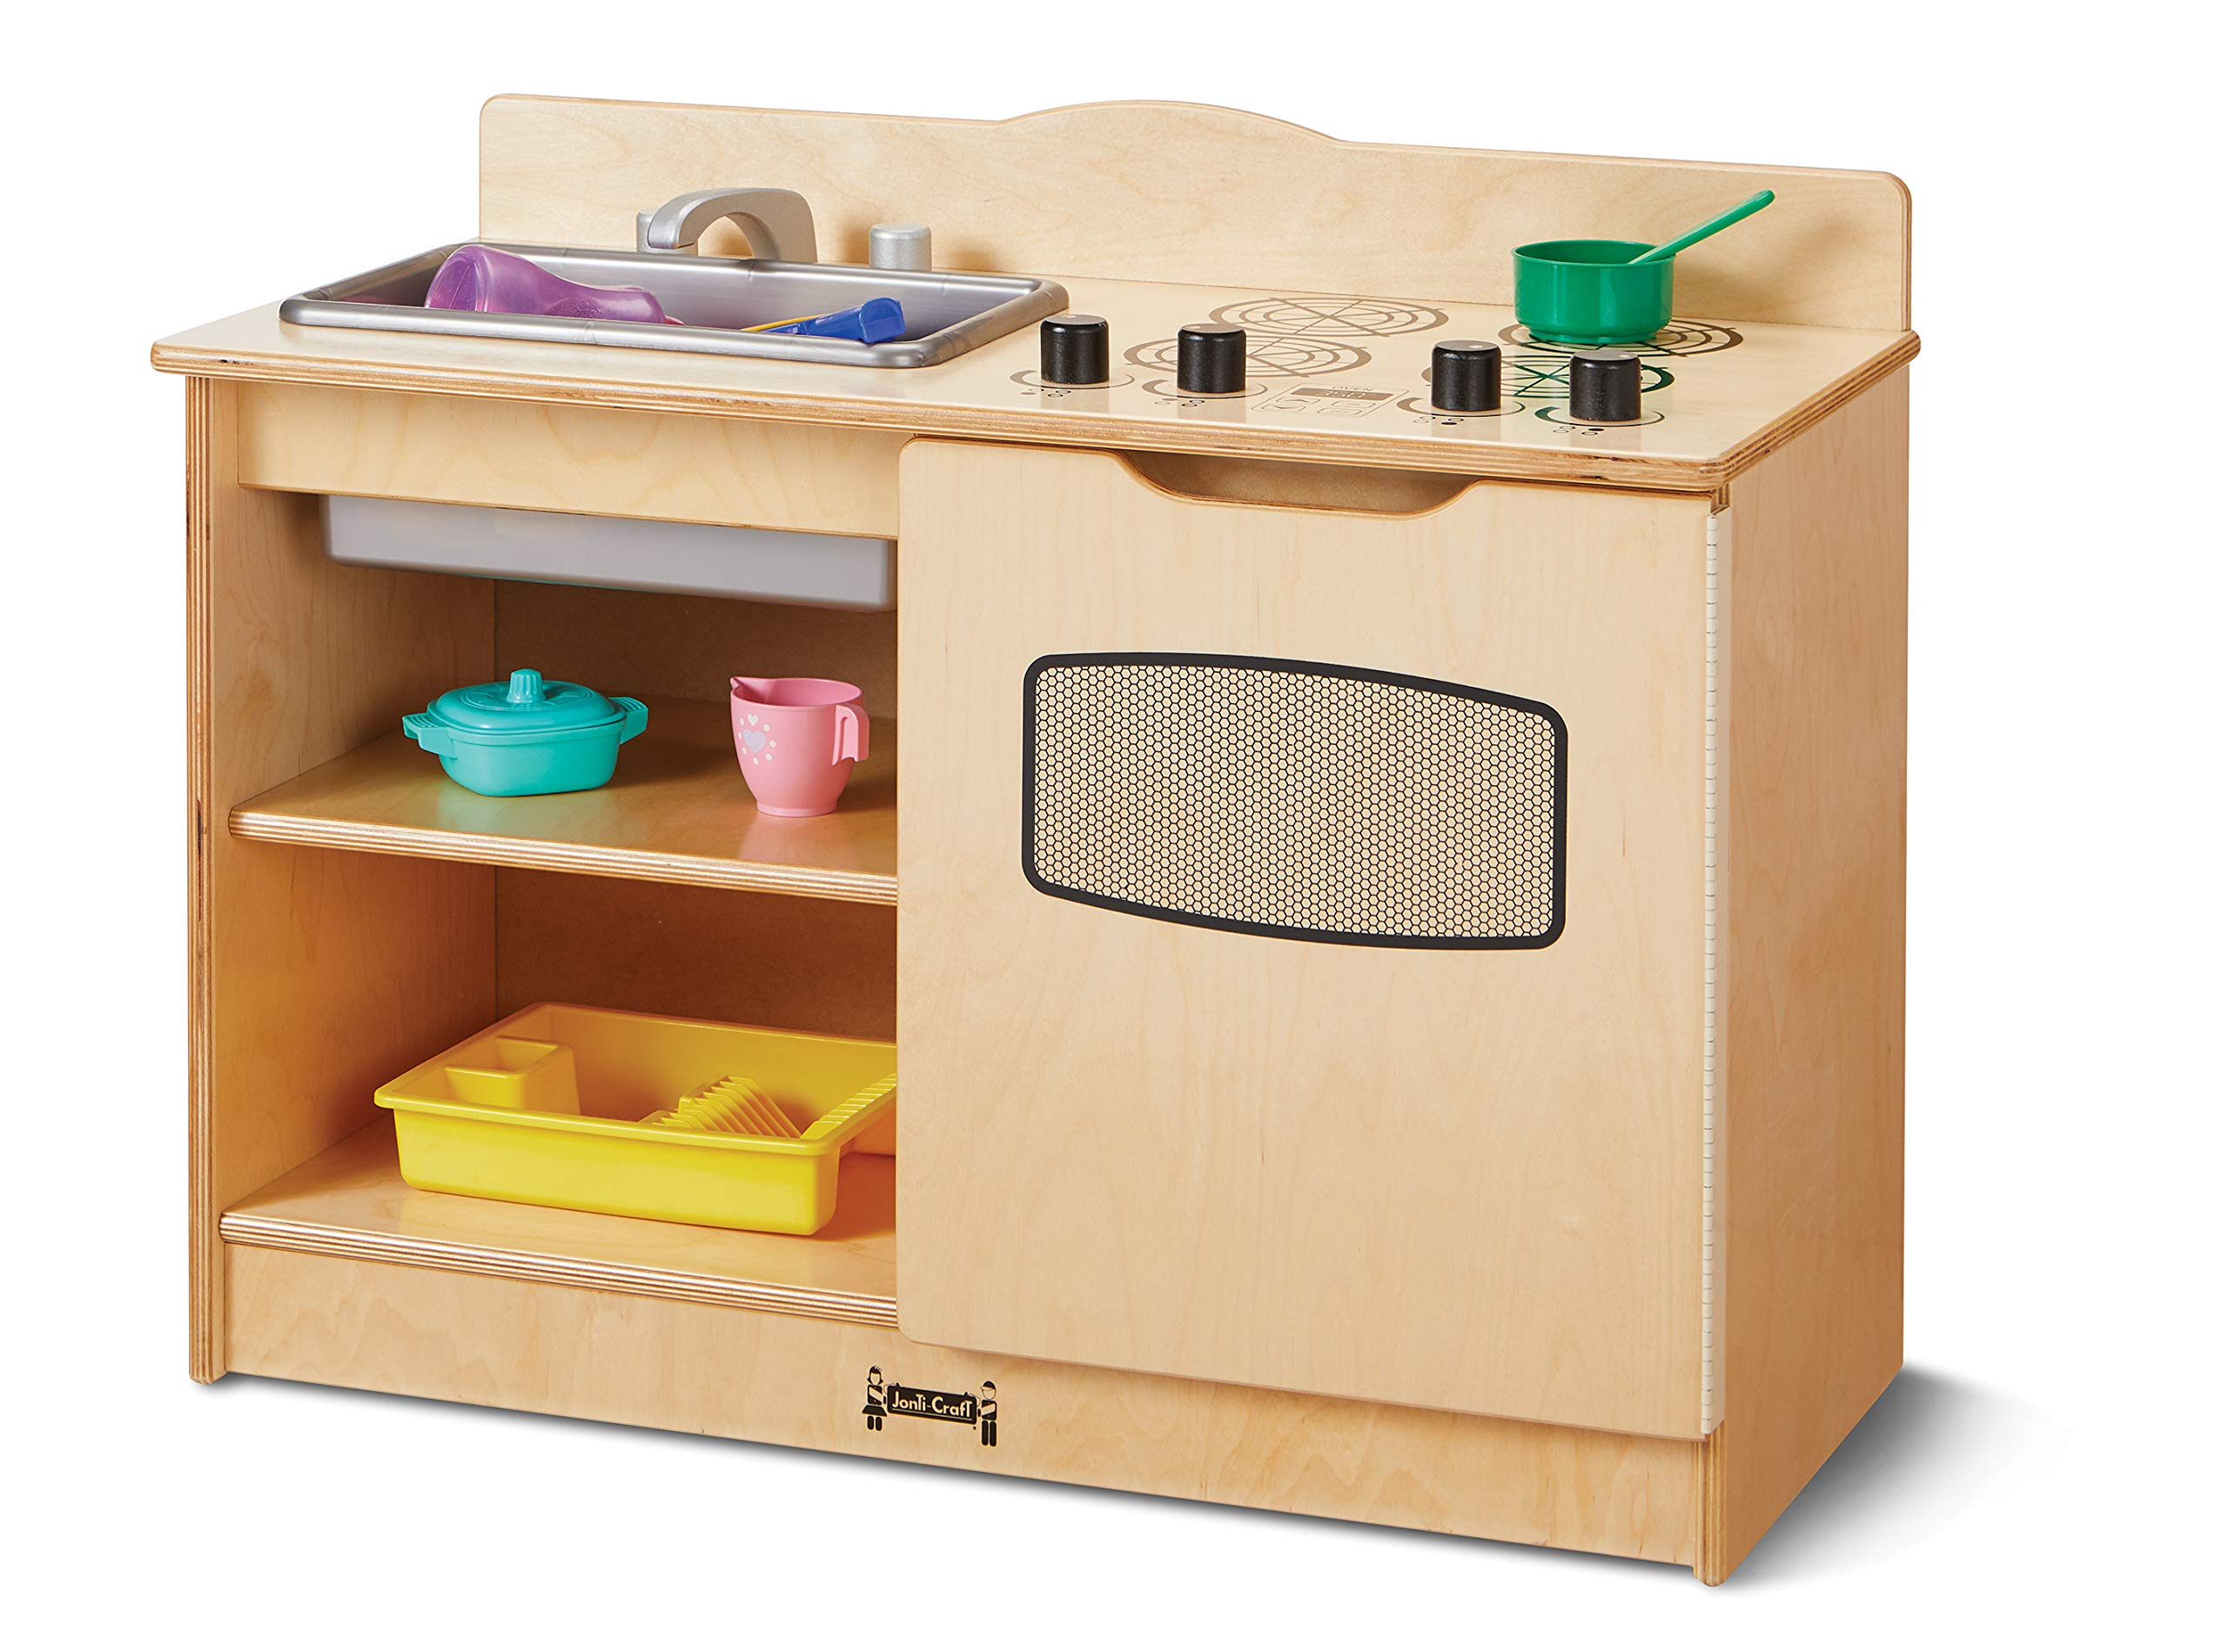 Jonti-Craft 2424JC Toddler Kitchen Café